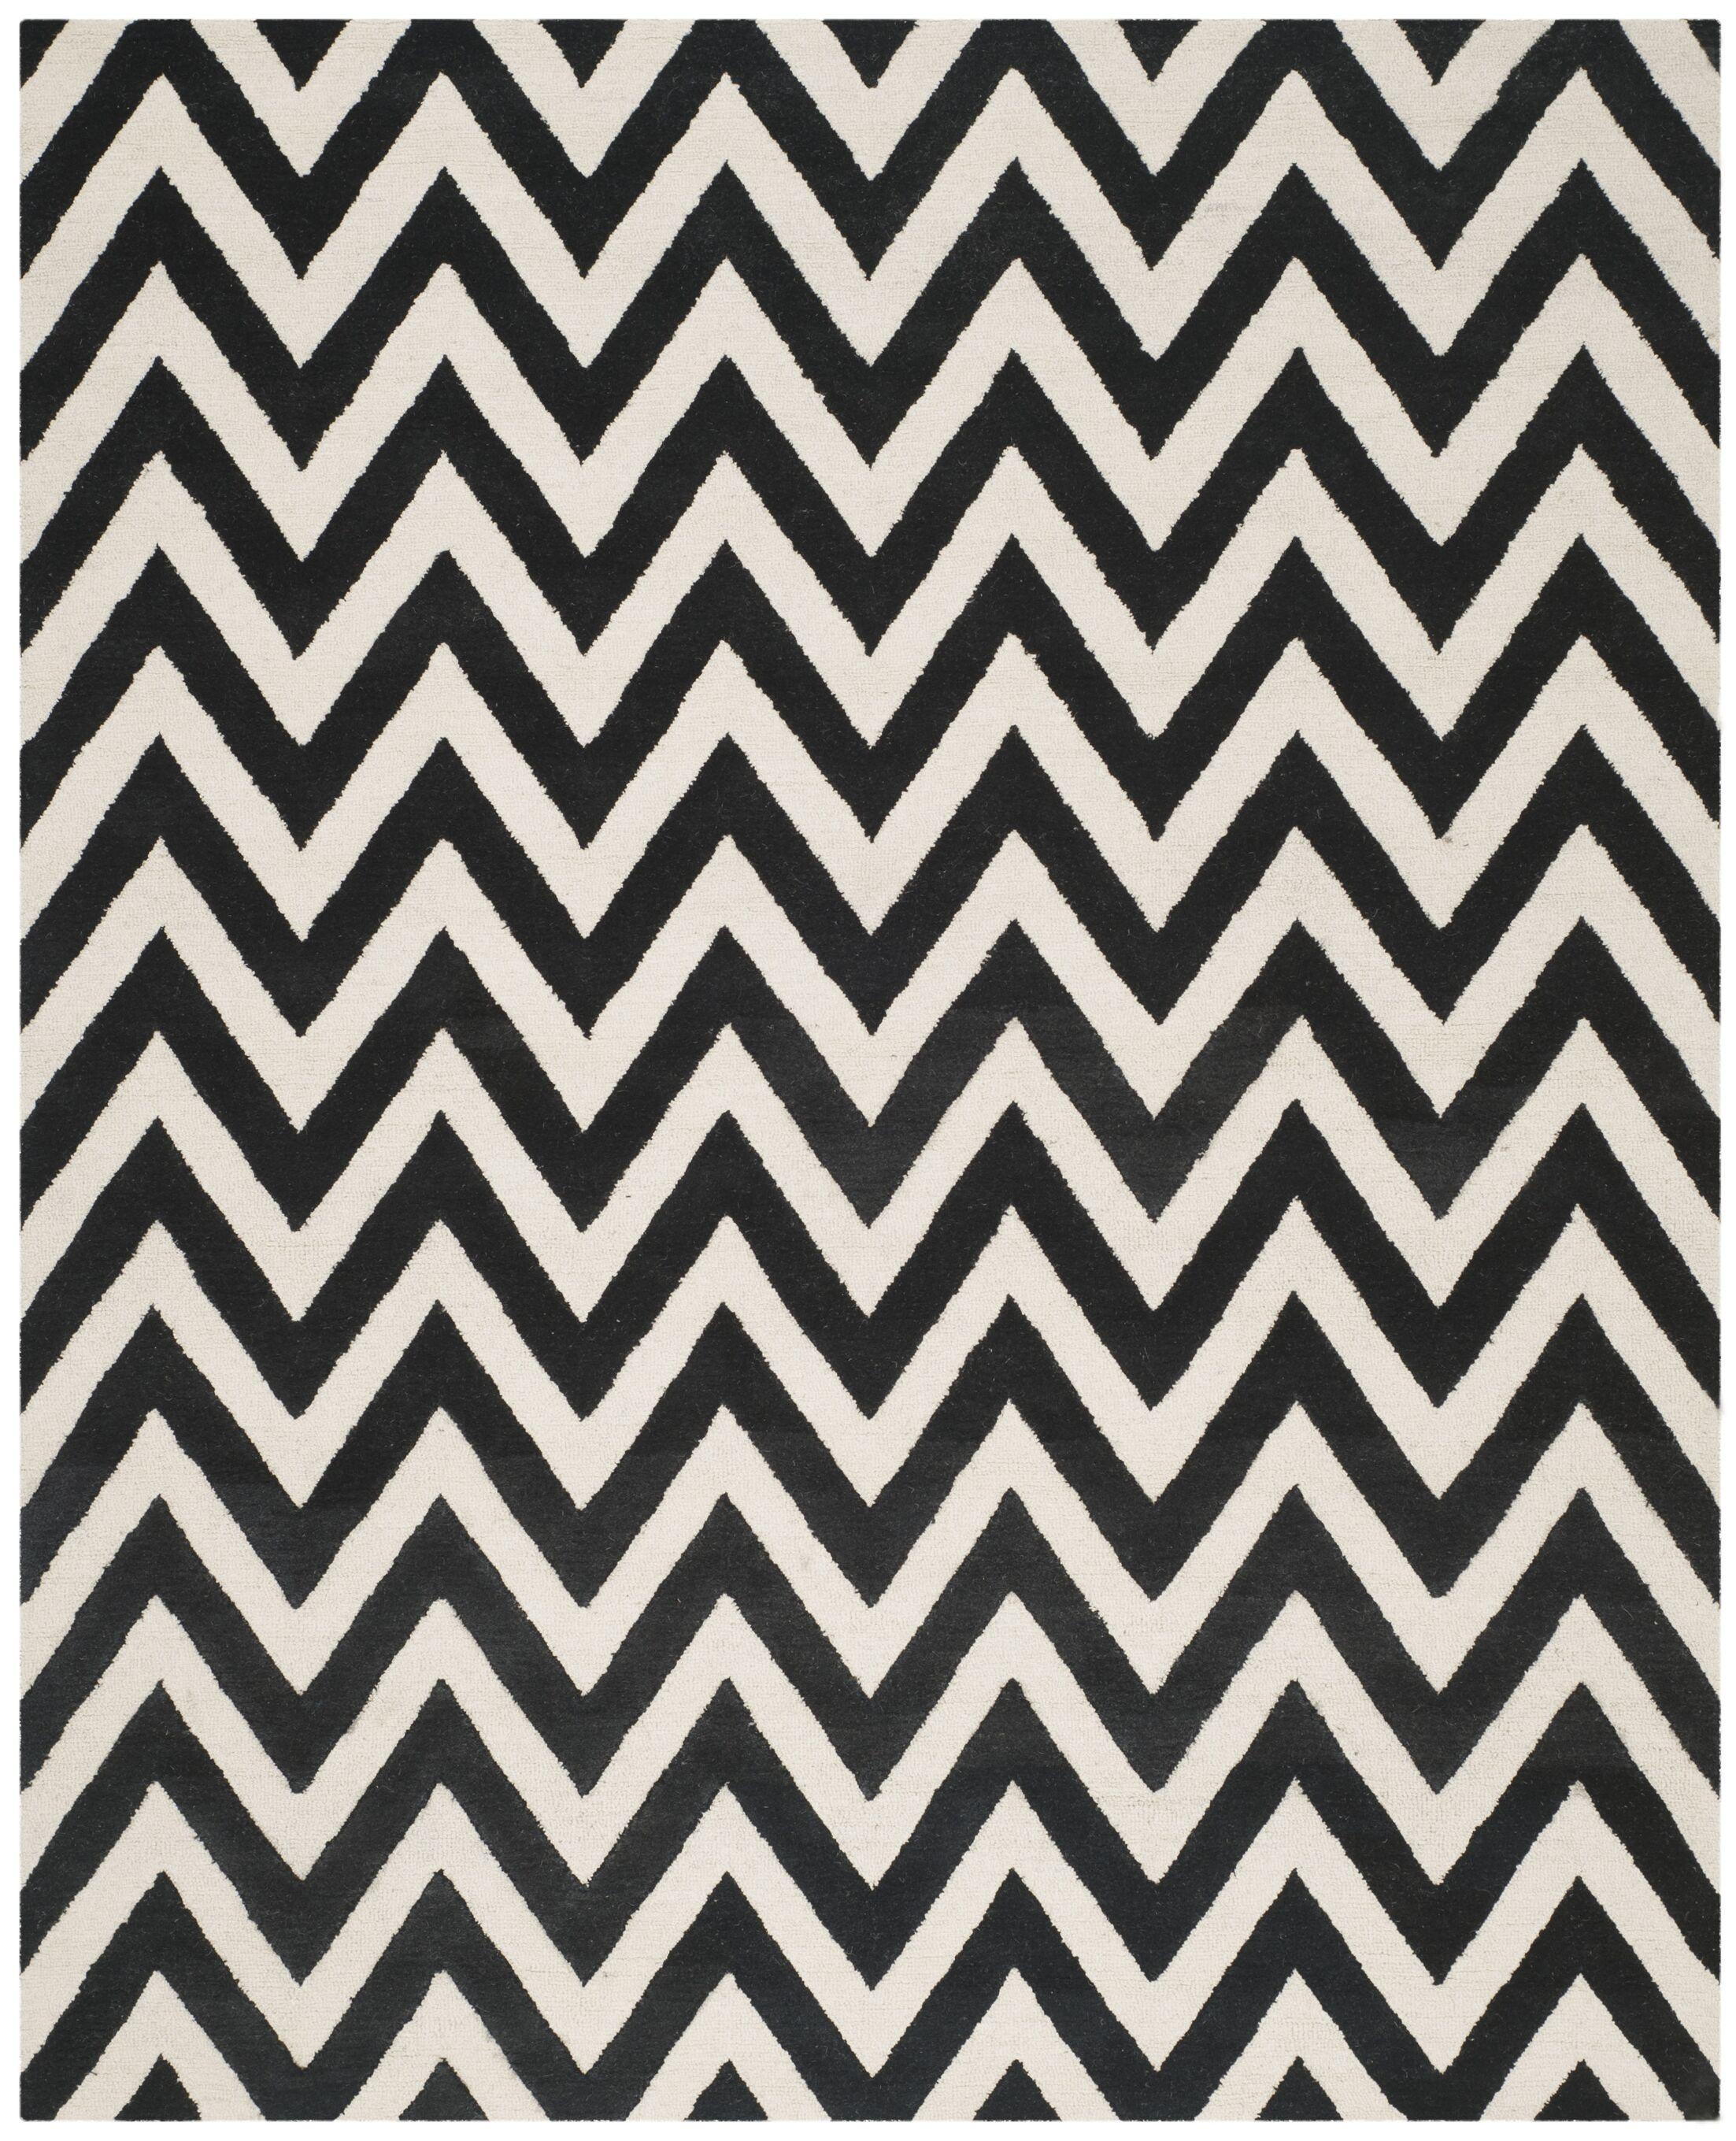 Daveney Hand-Tufted Wool Black/Ivory Area Rug Rug Size: Rectangle 9' x 12'